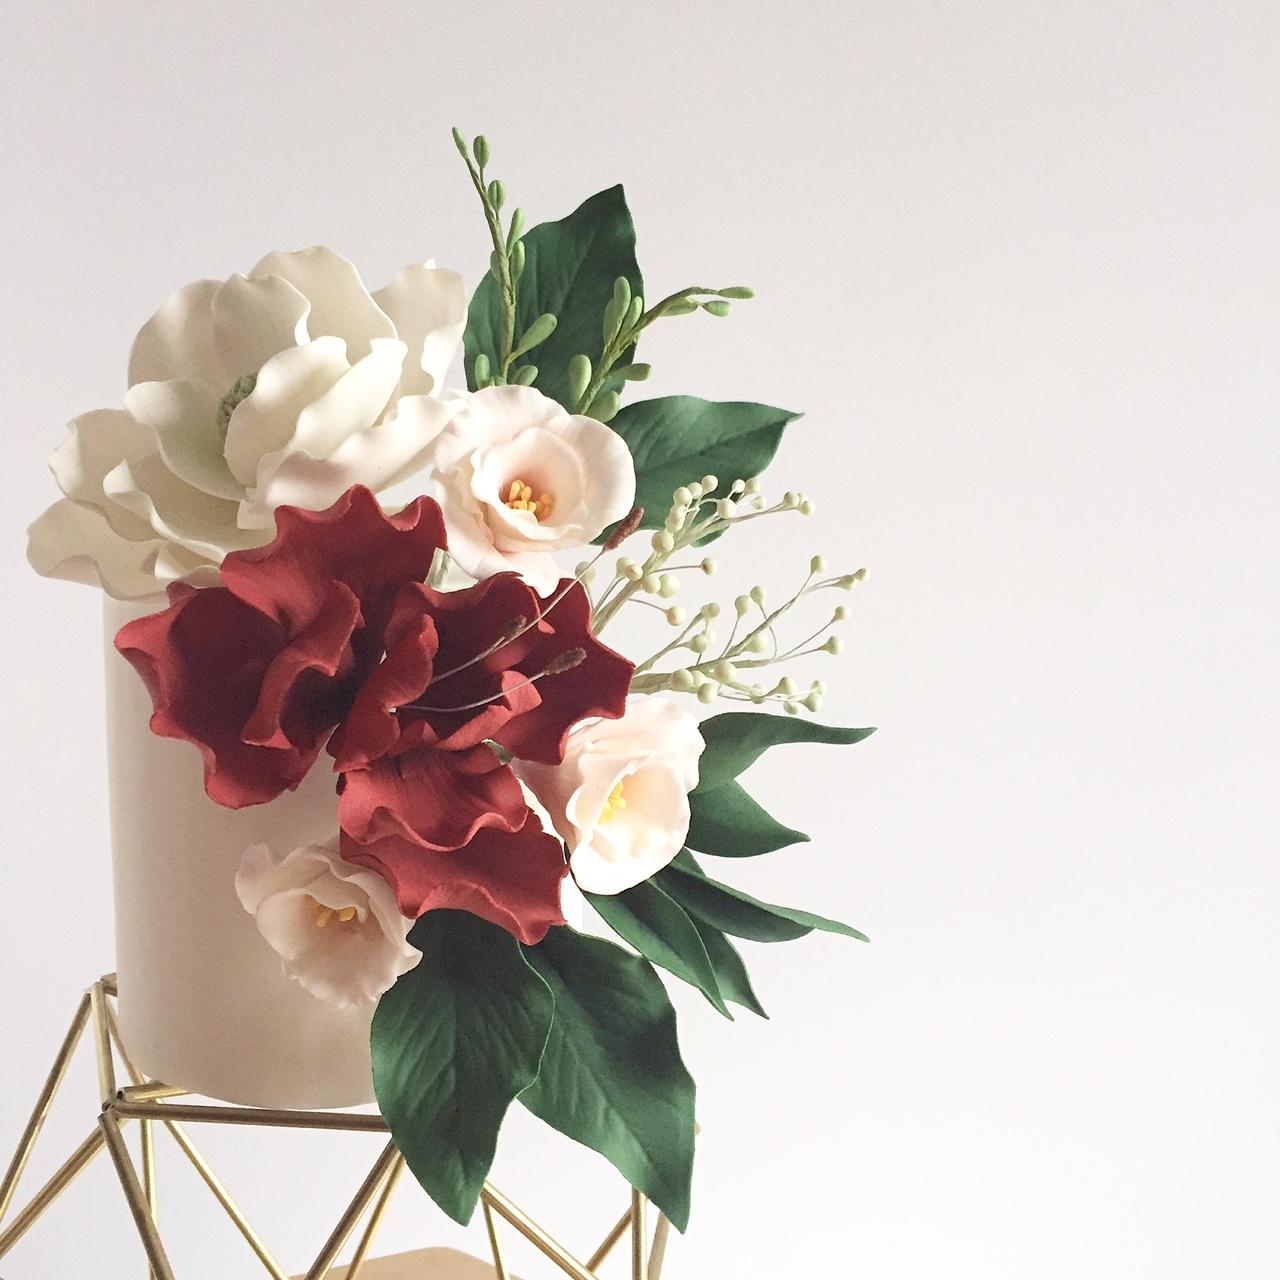 Mini Wedding with large sugar flower bouquet